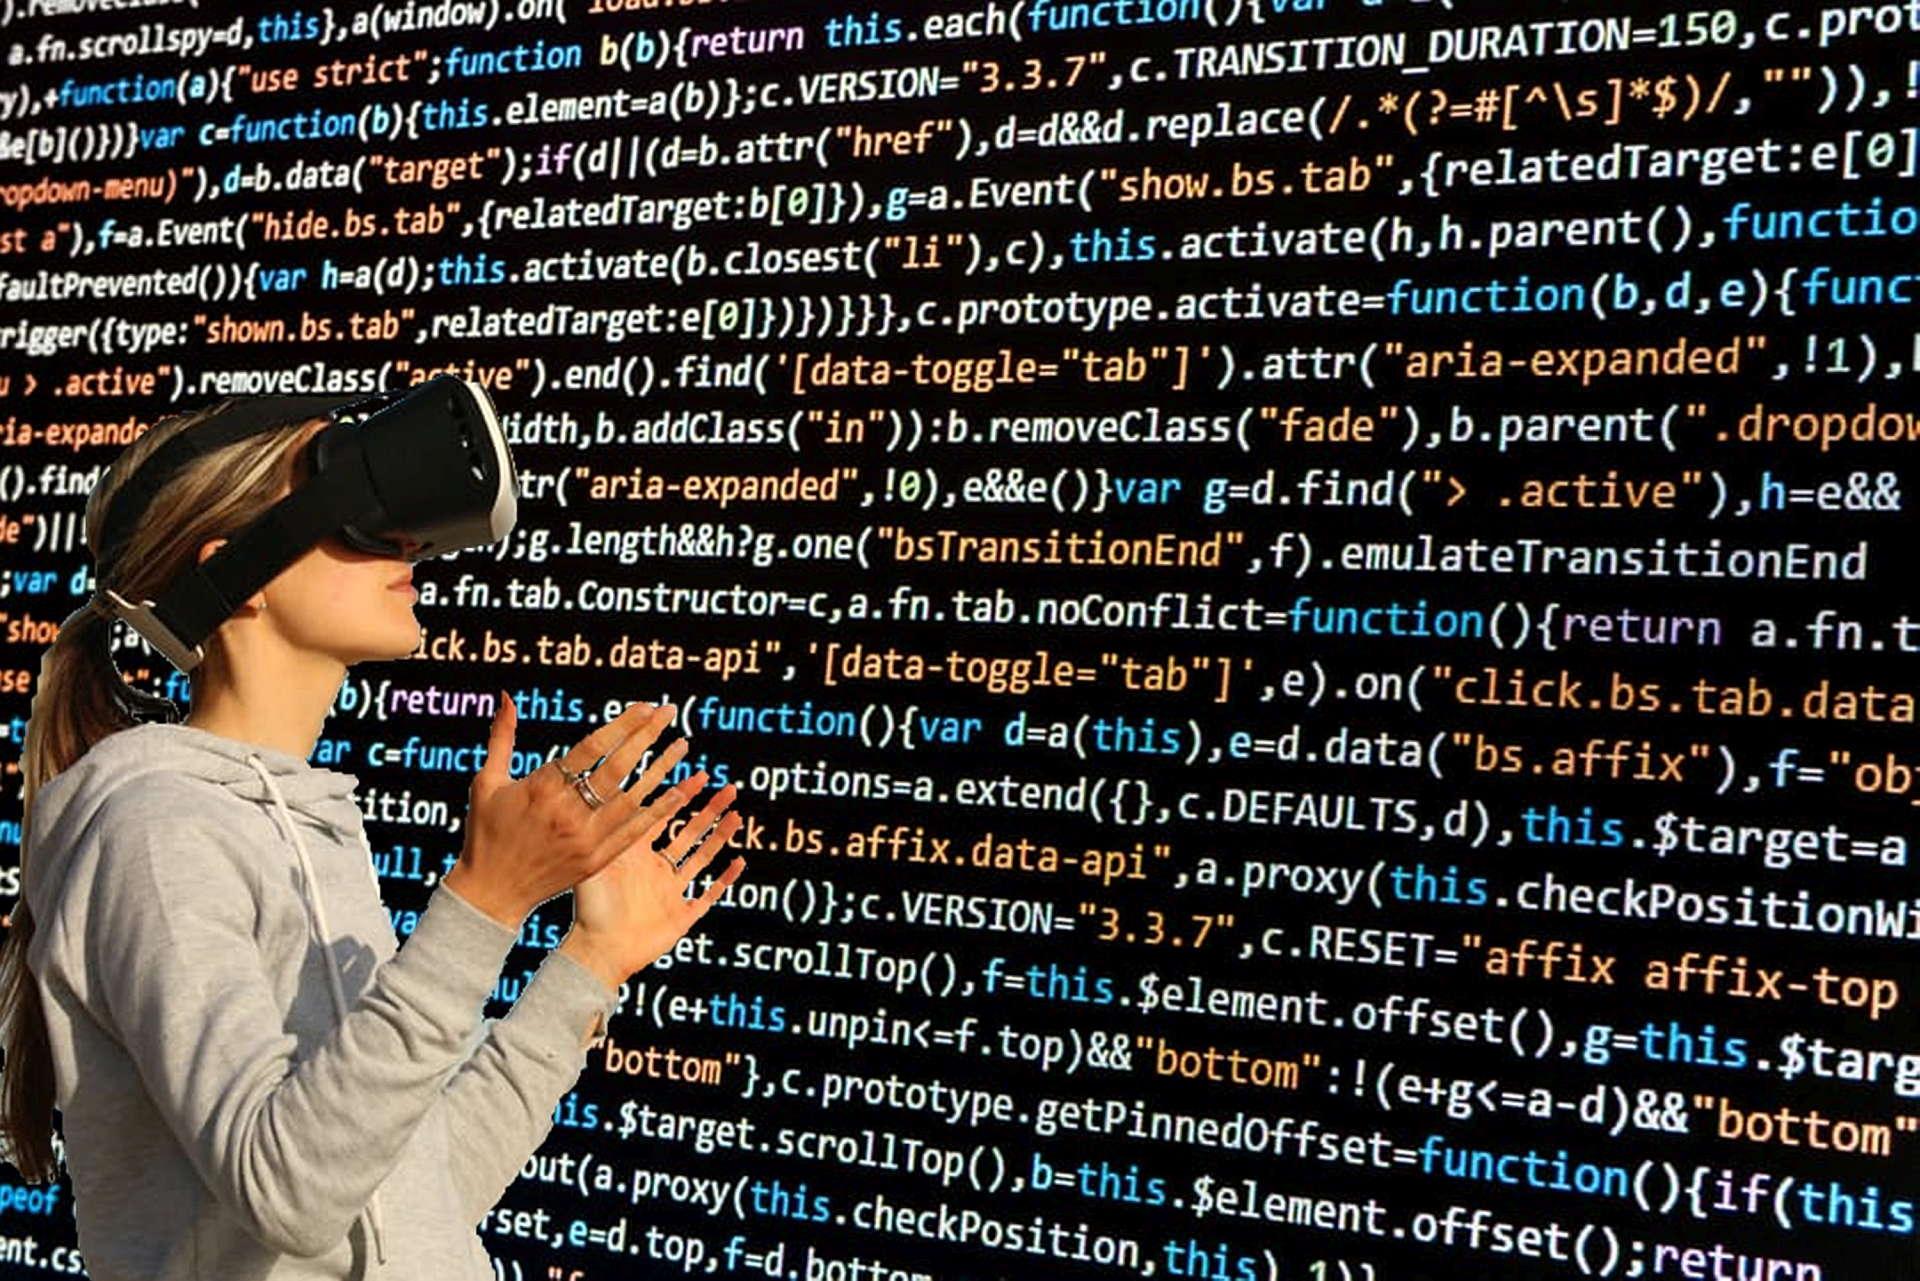 Cyberbrille - VR Brille